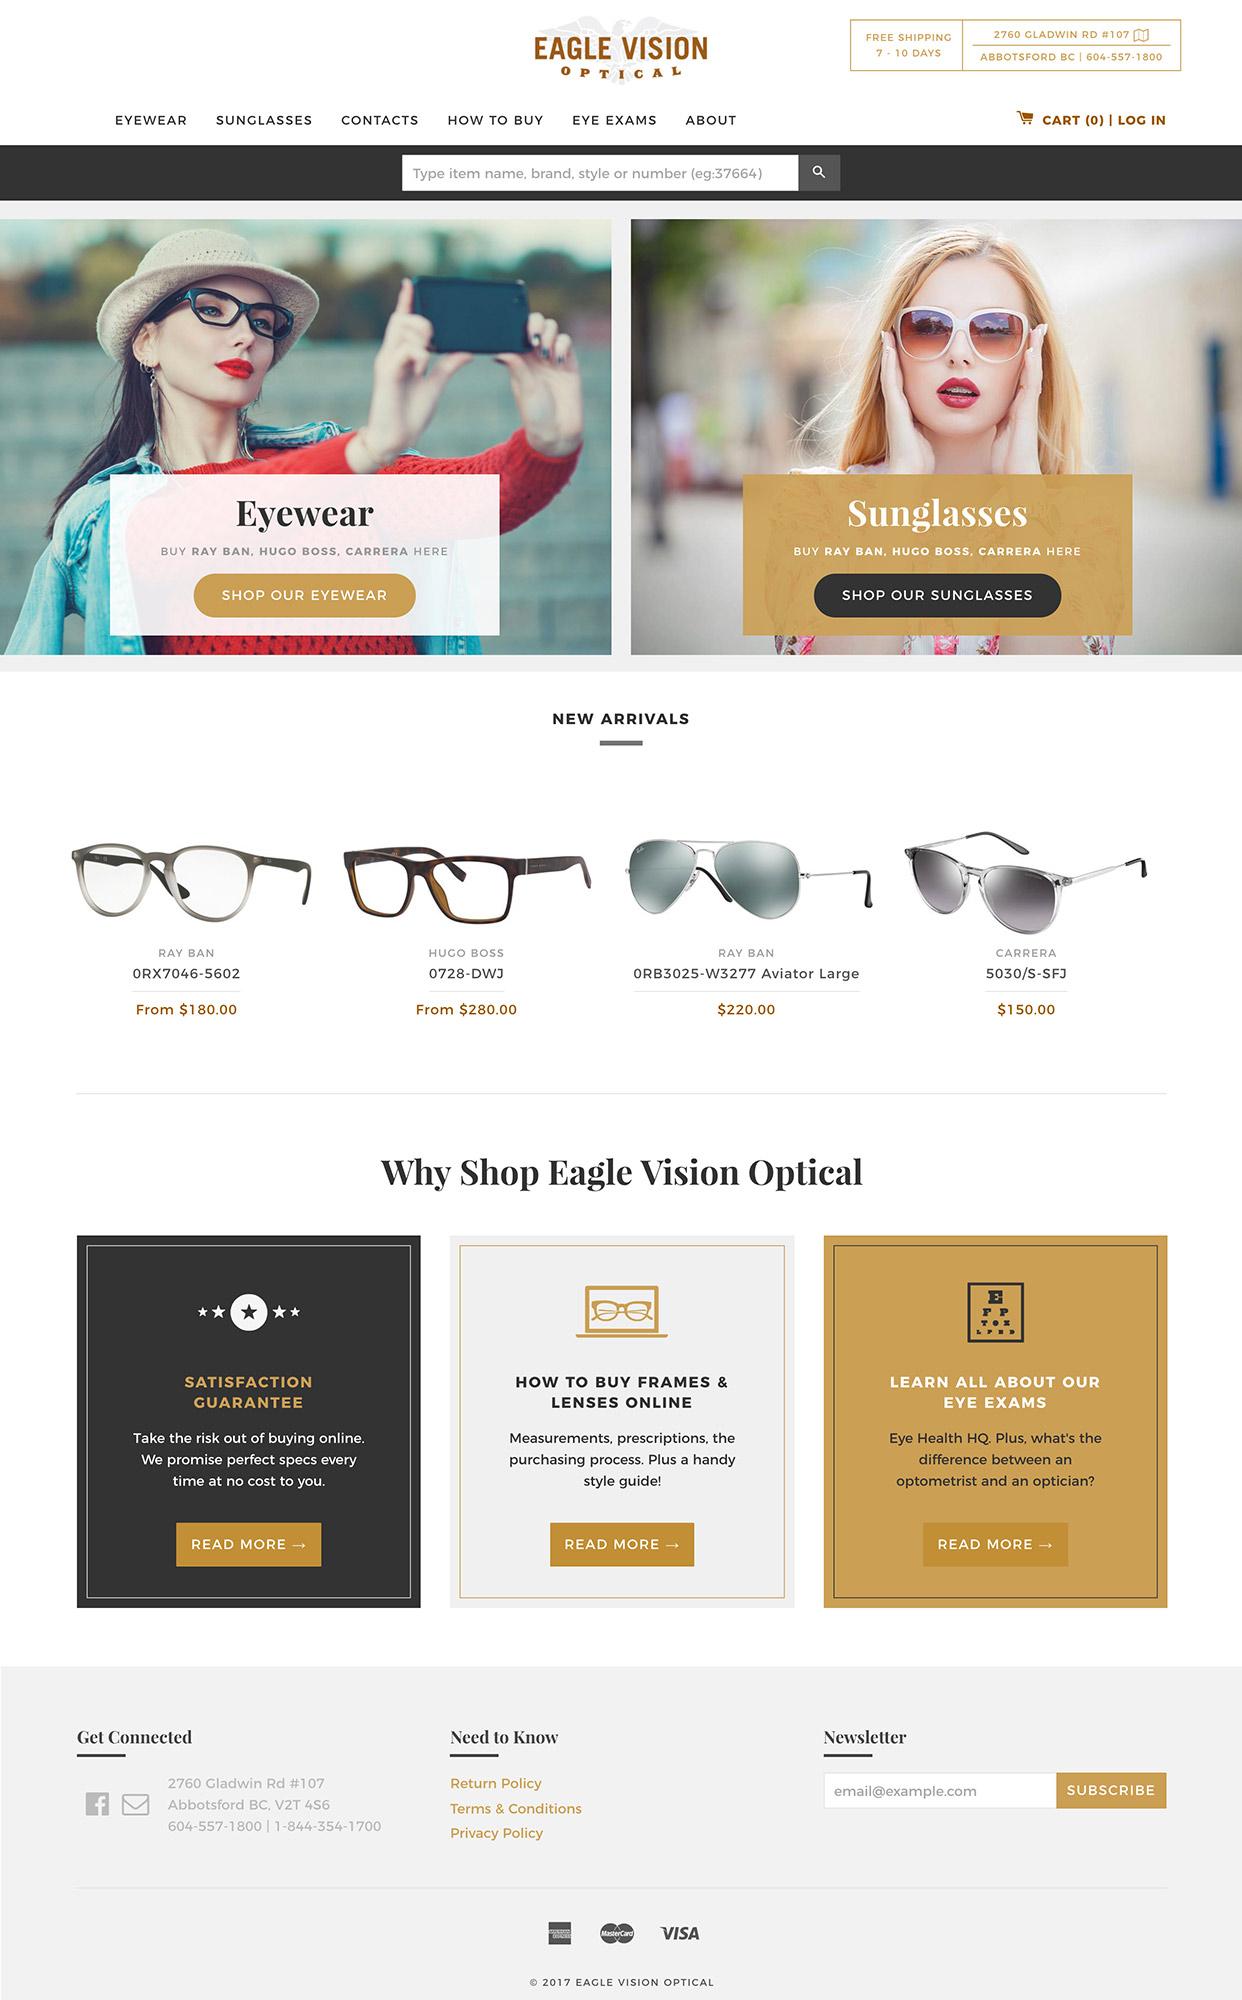 EV Optical on Shopify